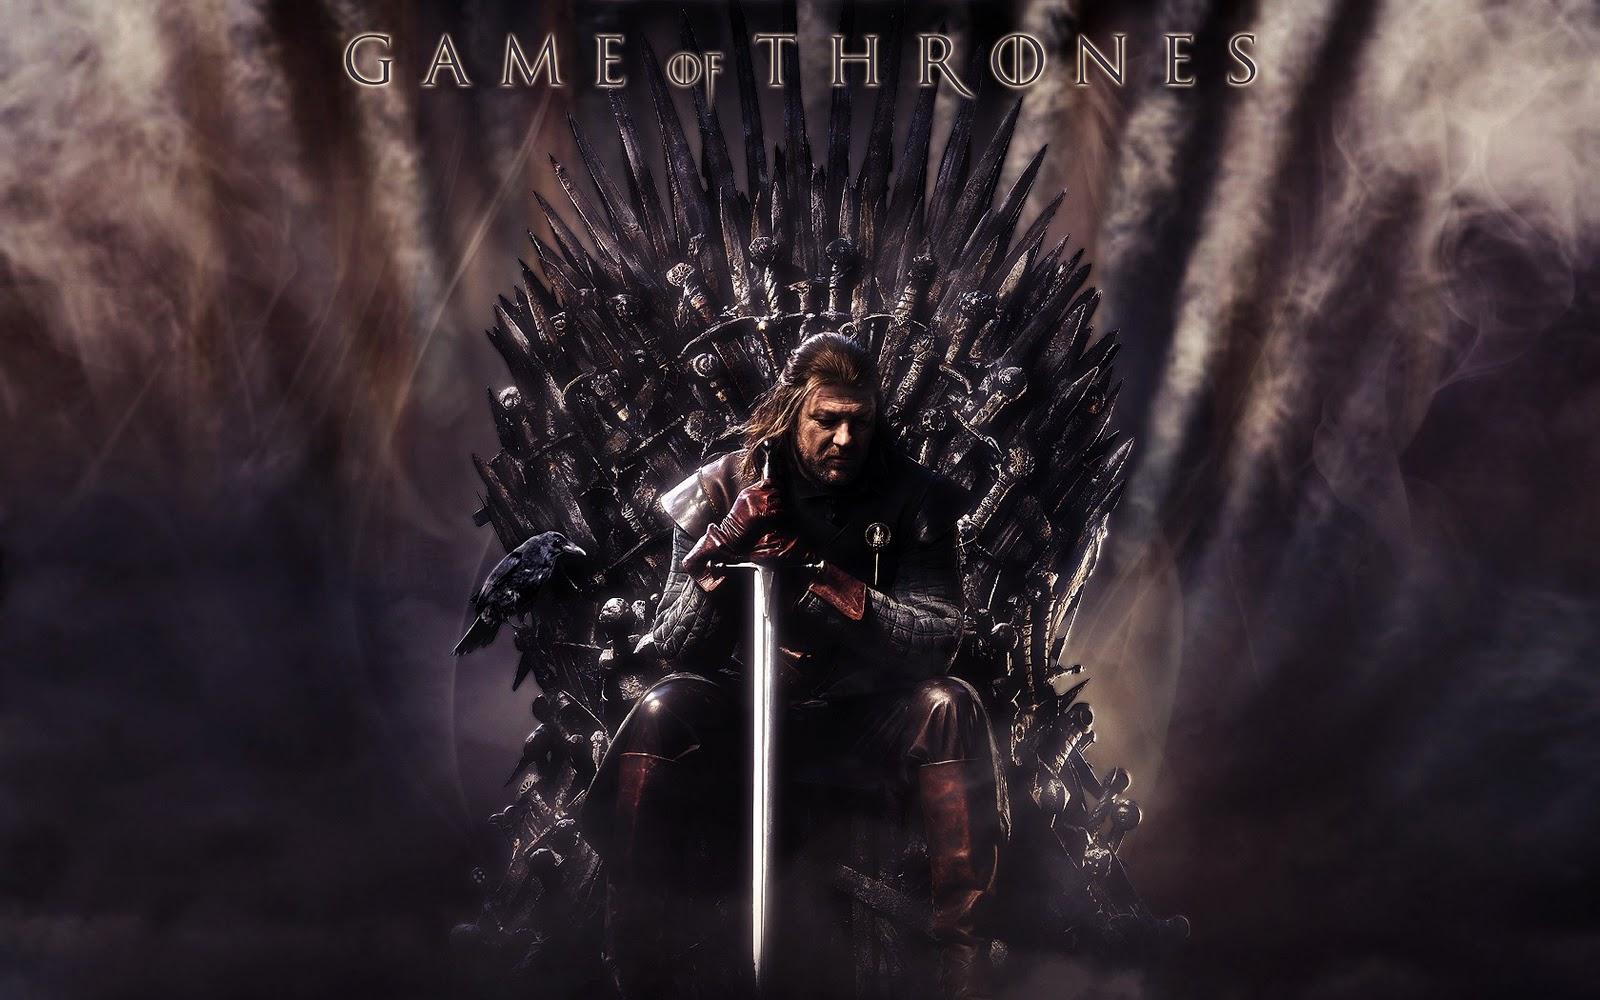 Eyesurfing Game of Thrones Wallpaper From TV Series 1600x1000